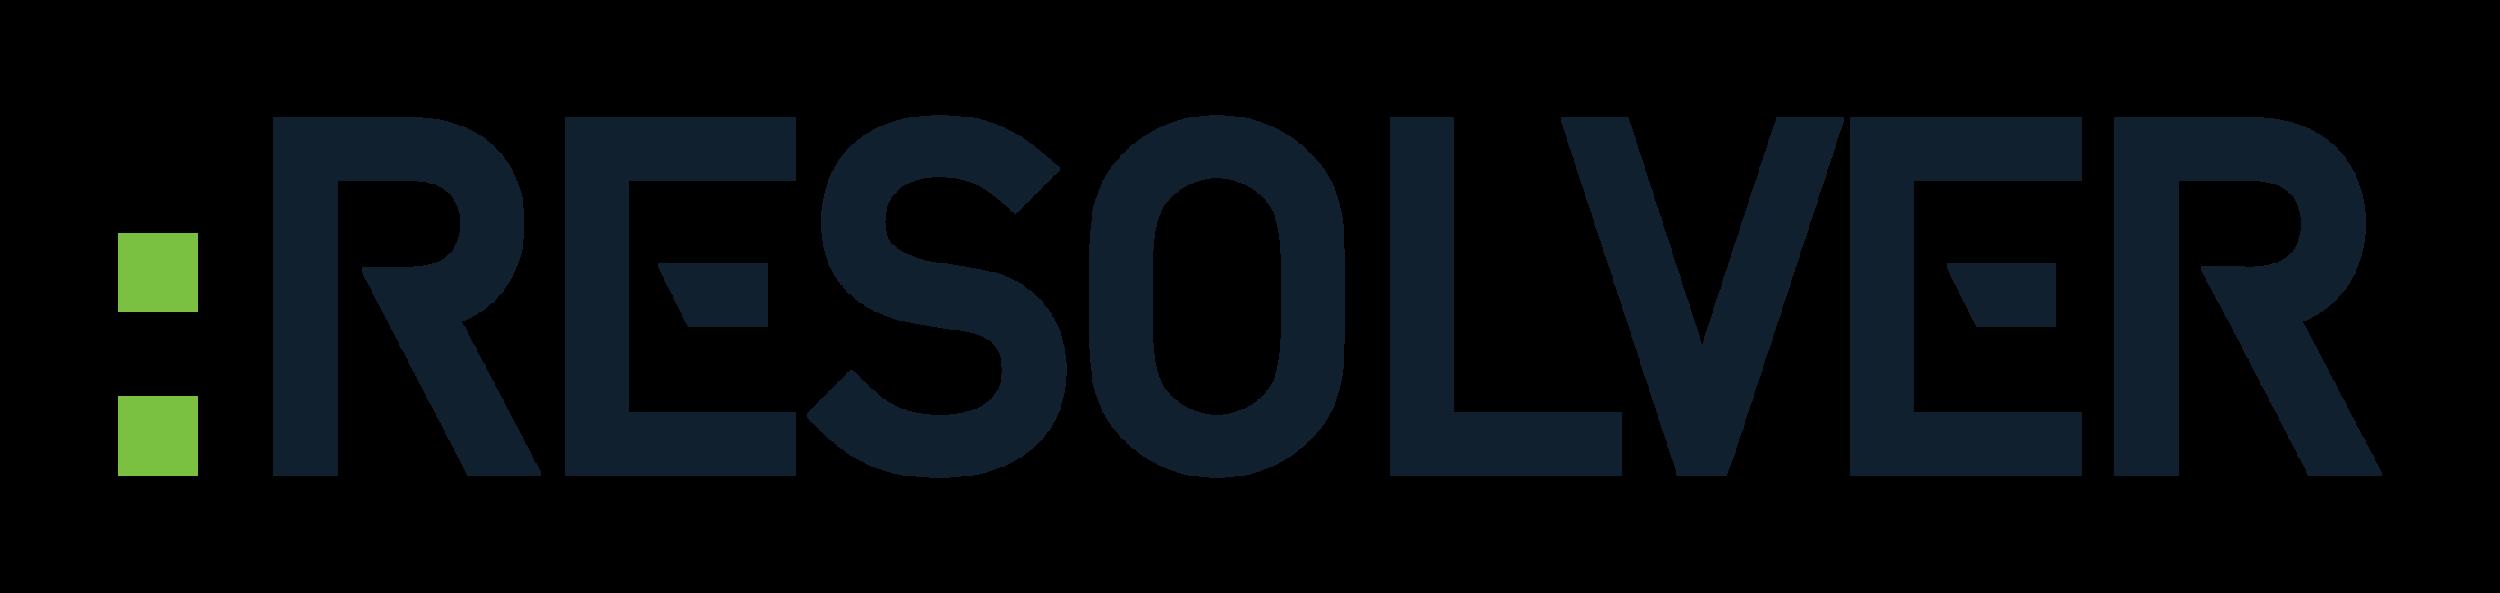 Resolver-Logo-2col_NoBG.png